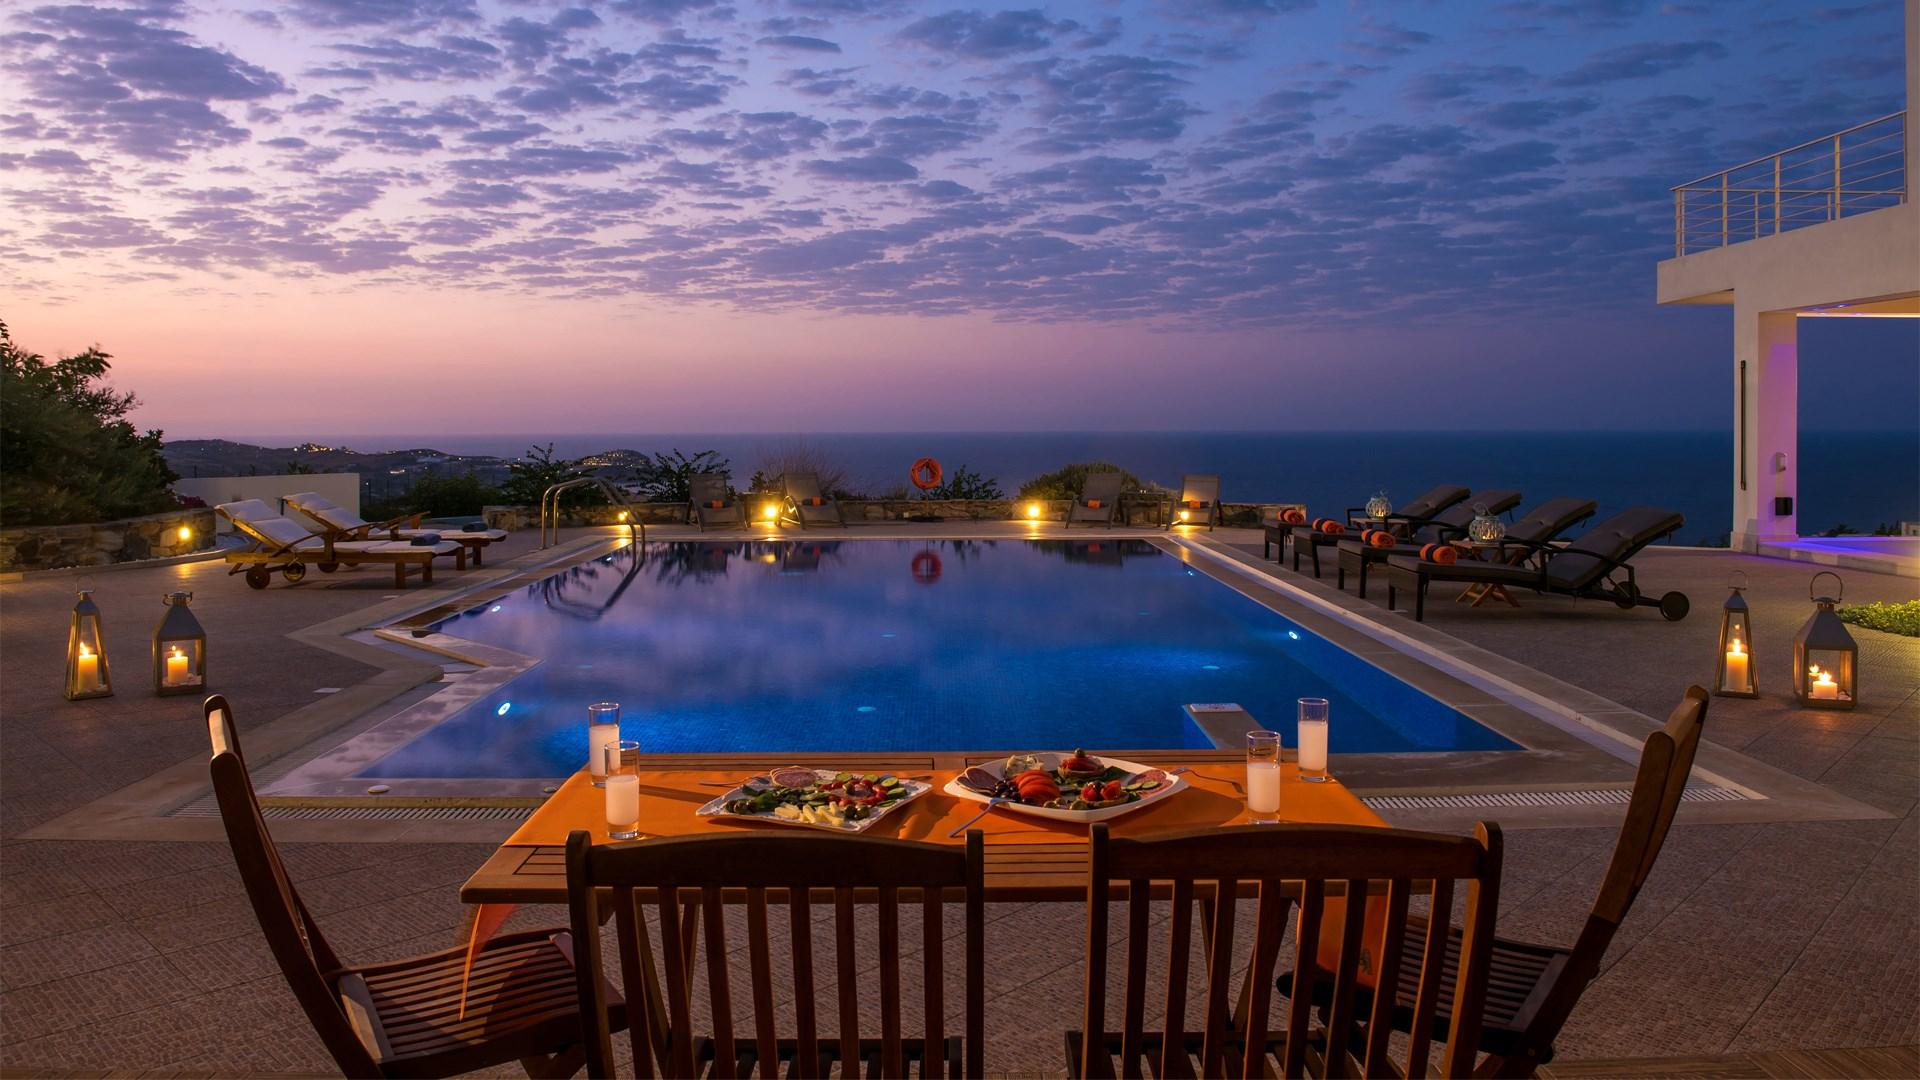 aspalathos villa agia pelagia heraklion crete. Black Bedroom Furniture Sets. Home Design Ideas